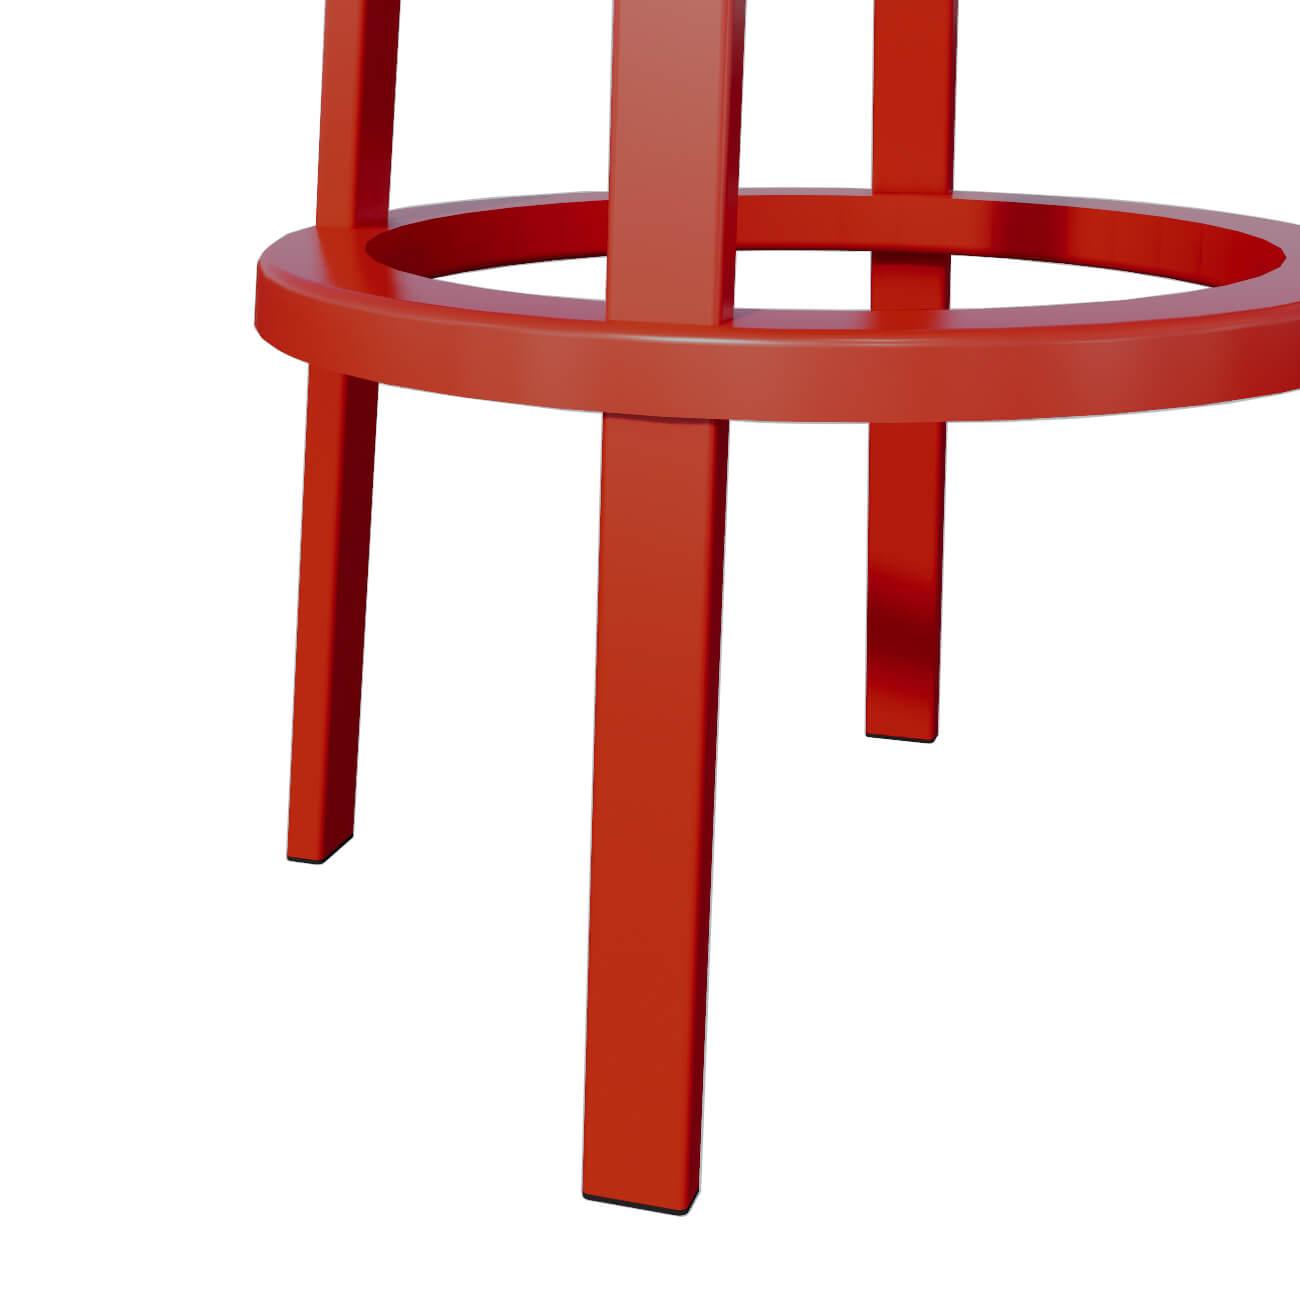 RED STOOL - BASE